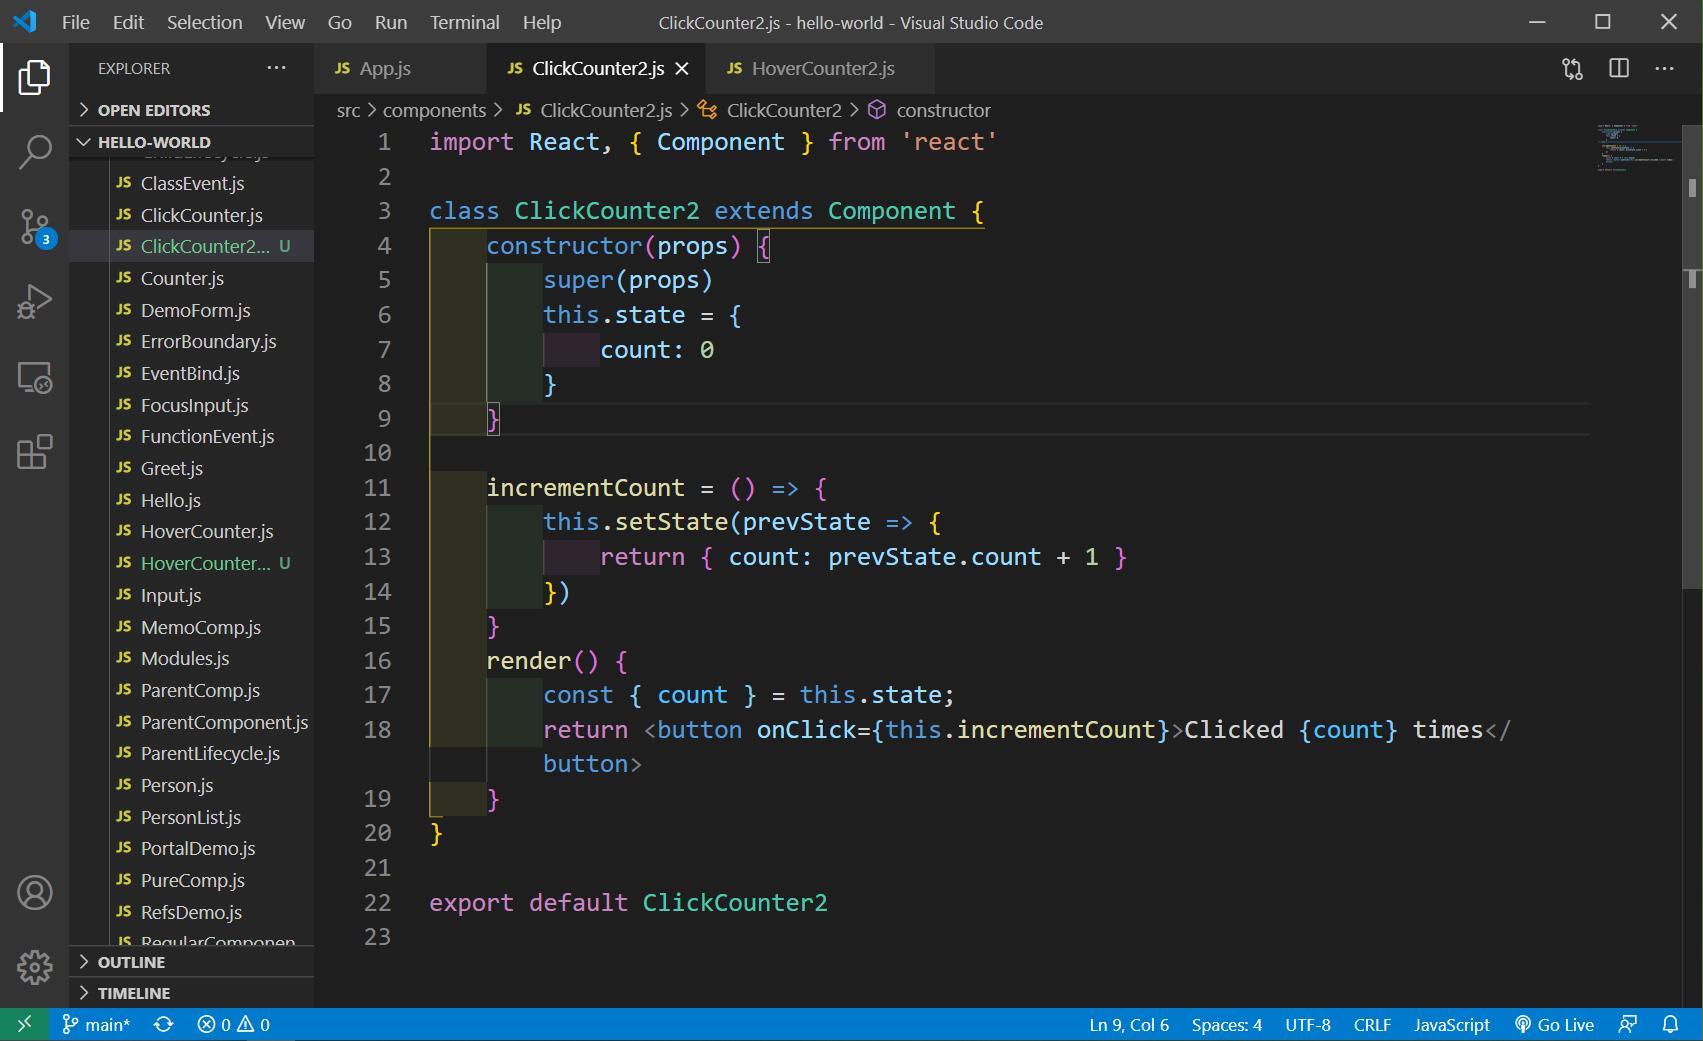 ClickCounter2.js